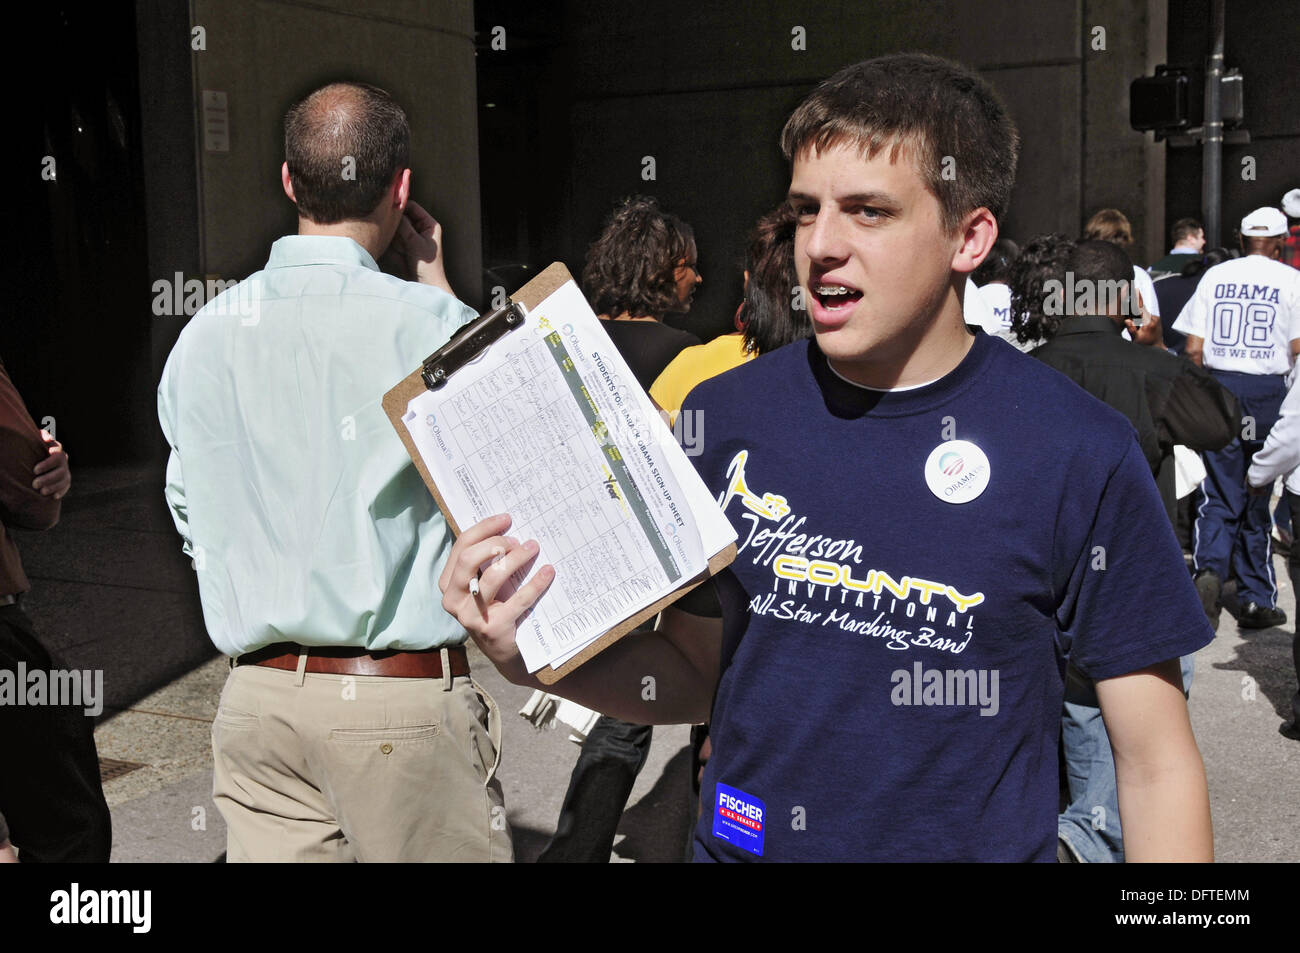 Political demonstrator Louisville Kentucky KY - Stock Image